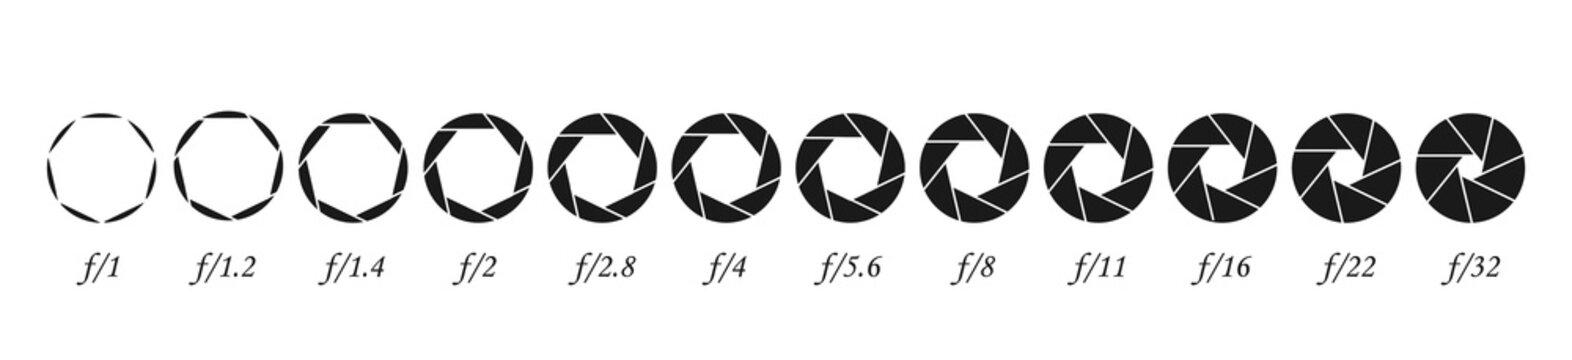 Set of apertures for the lens. Membrane camera lens. Diaphragm numbers.